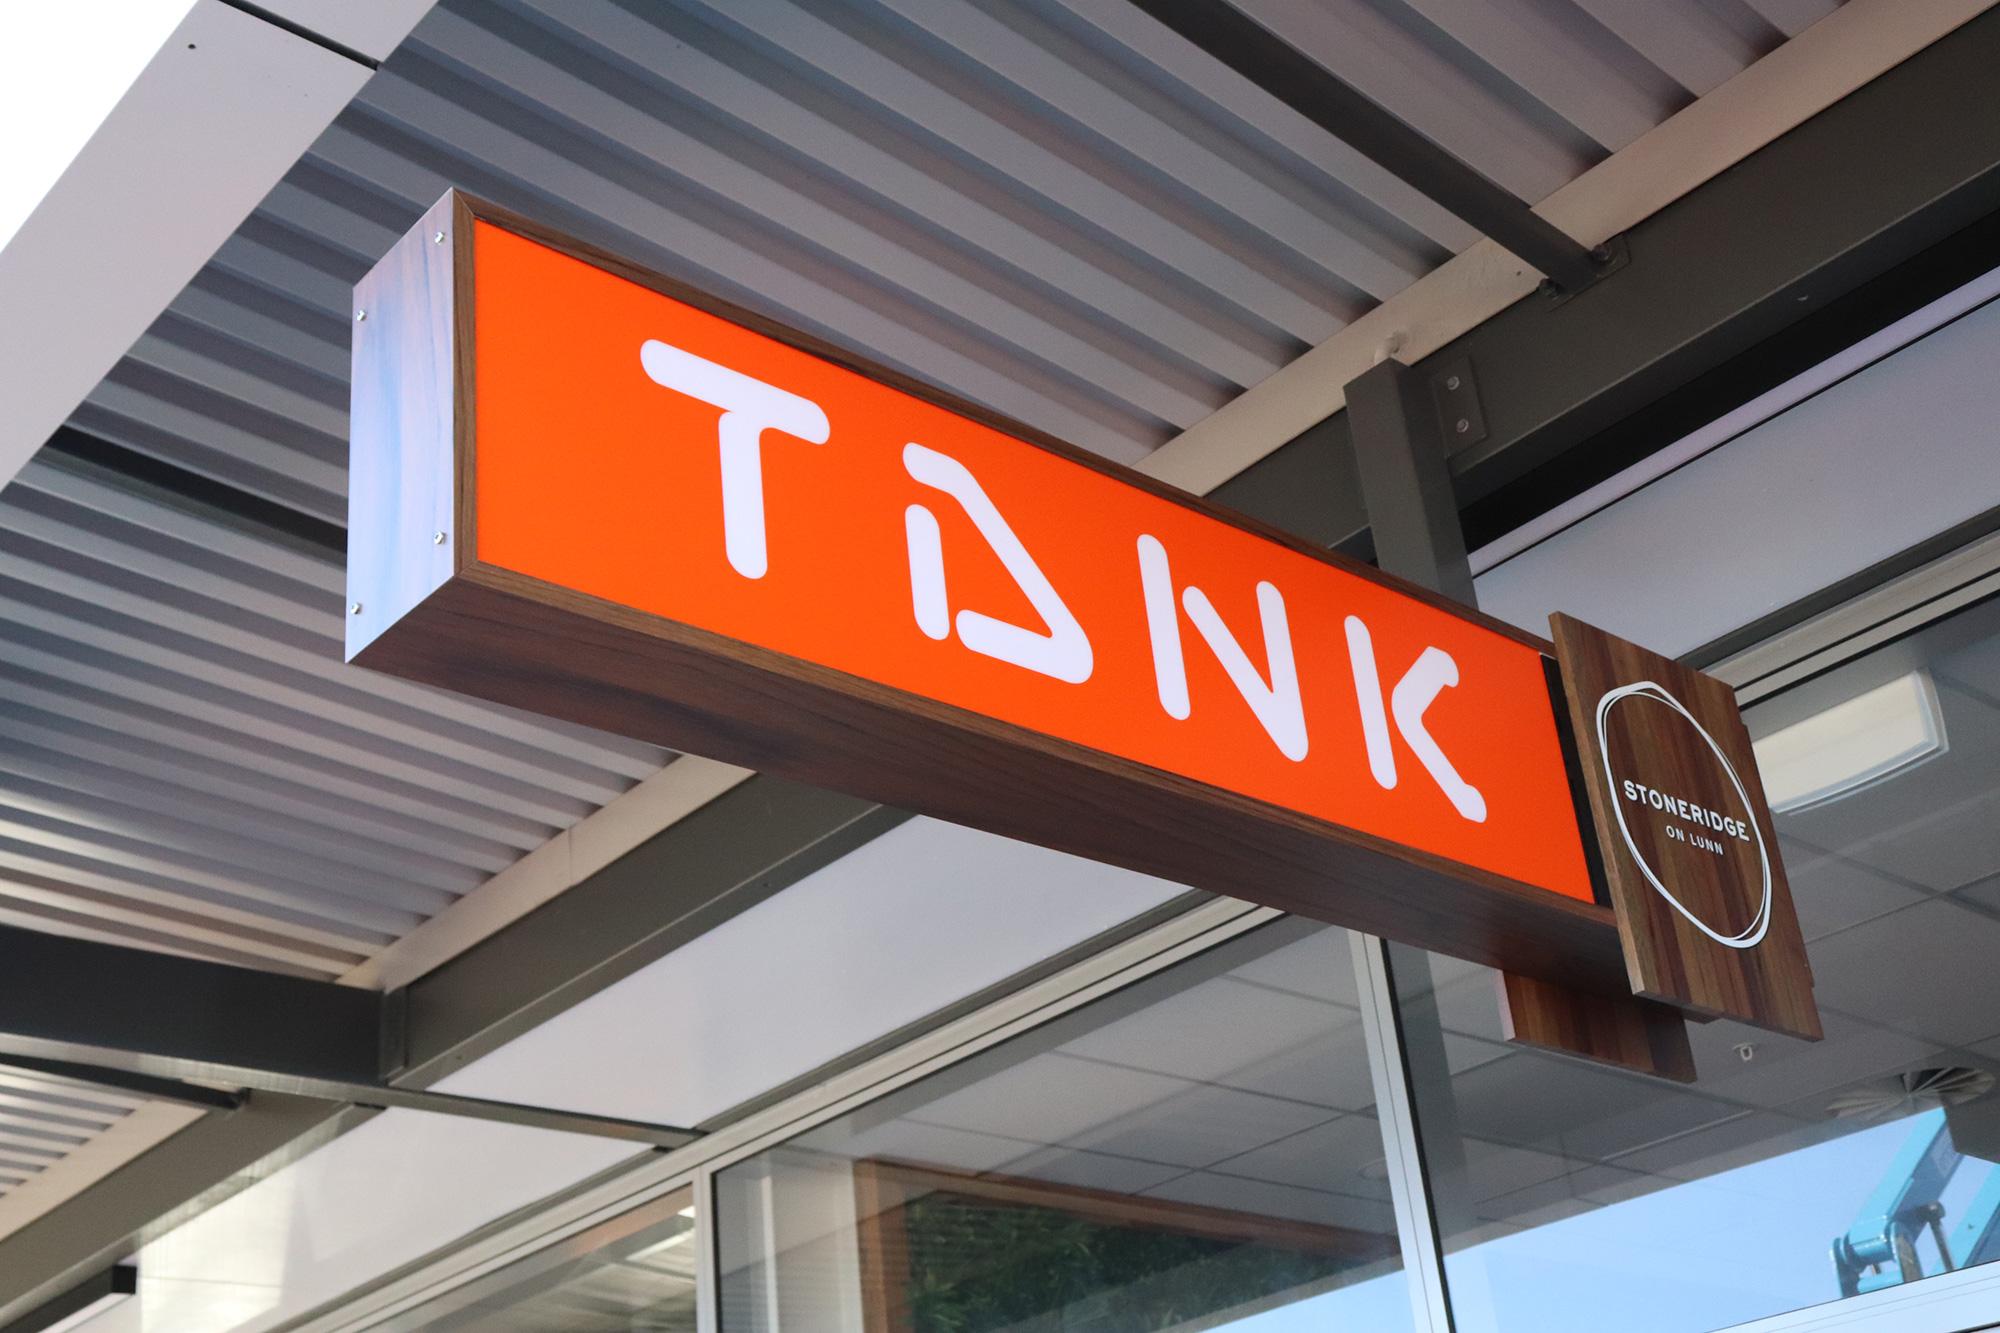 Tank Juice internally lit verandah sign